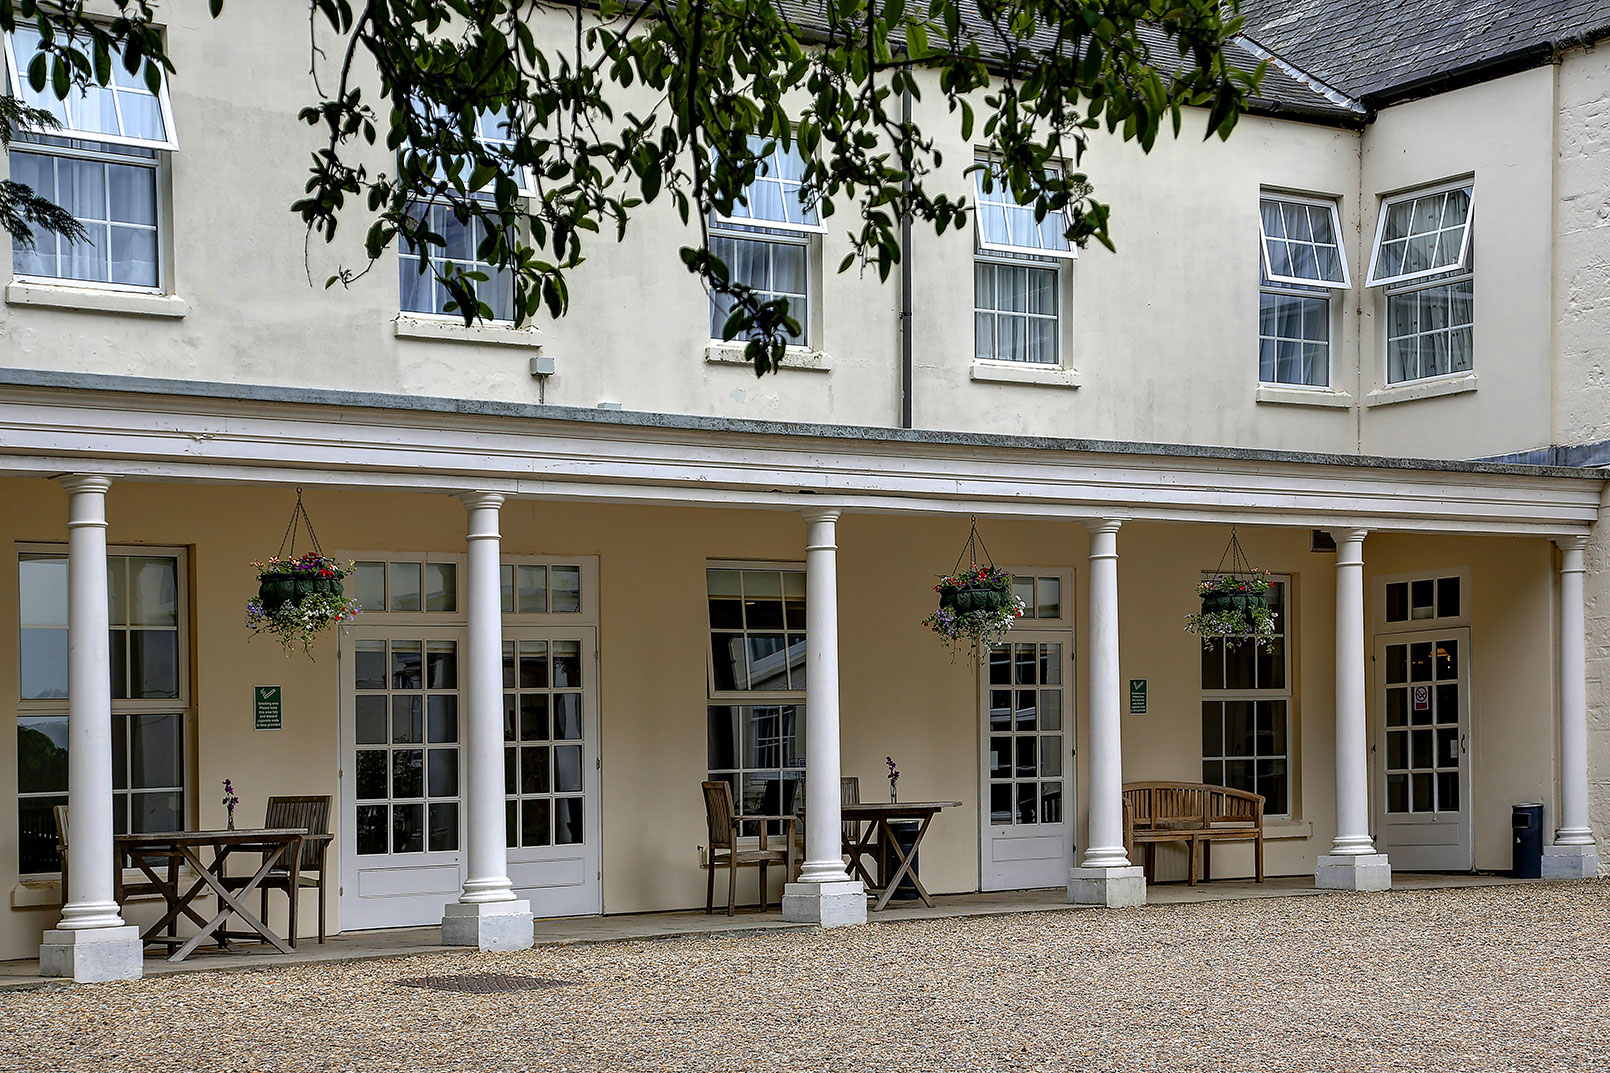 Best Western Royal Chase Hotel Shaftesbury